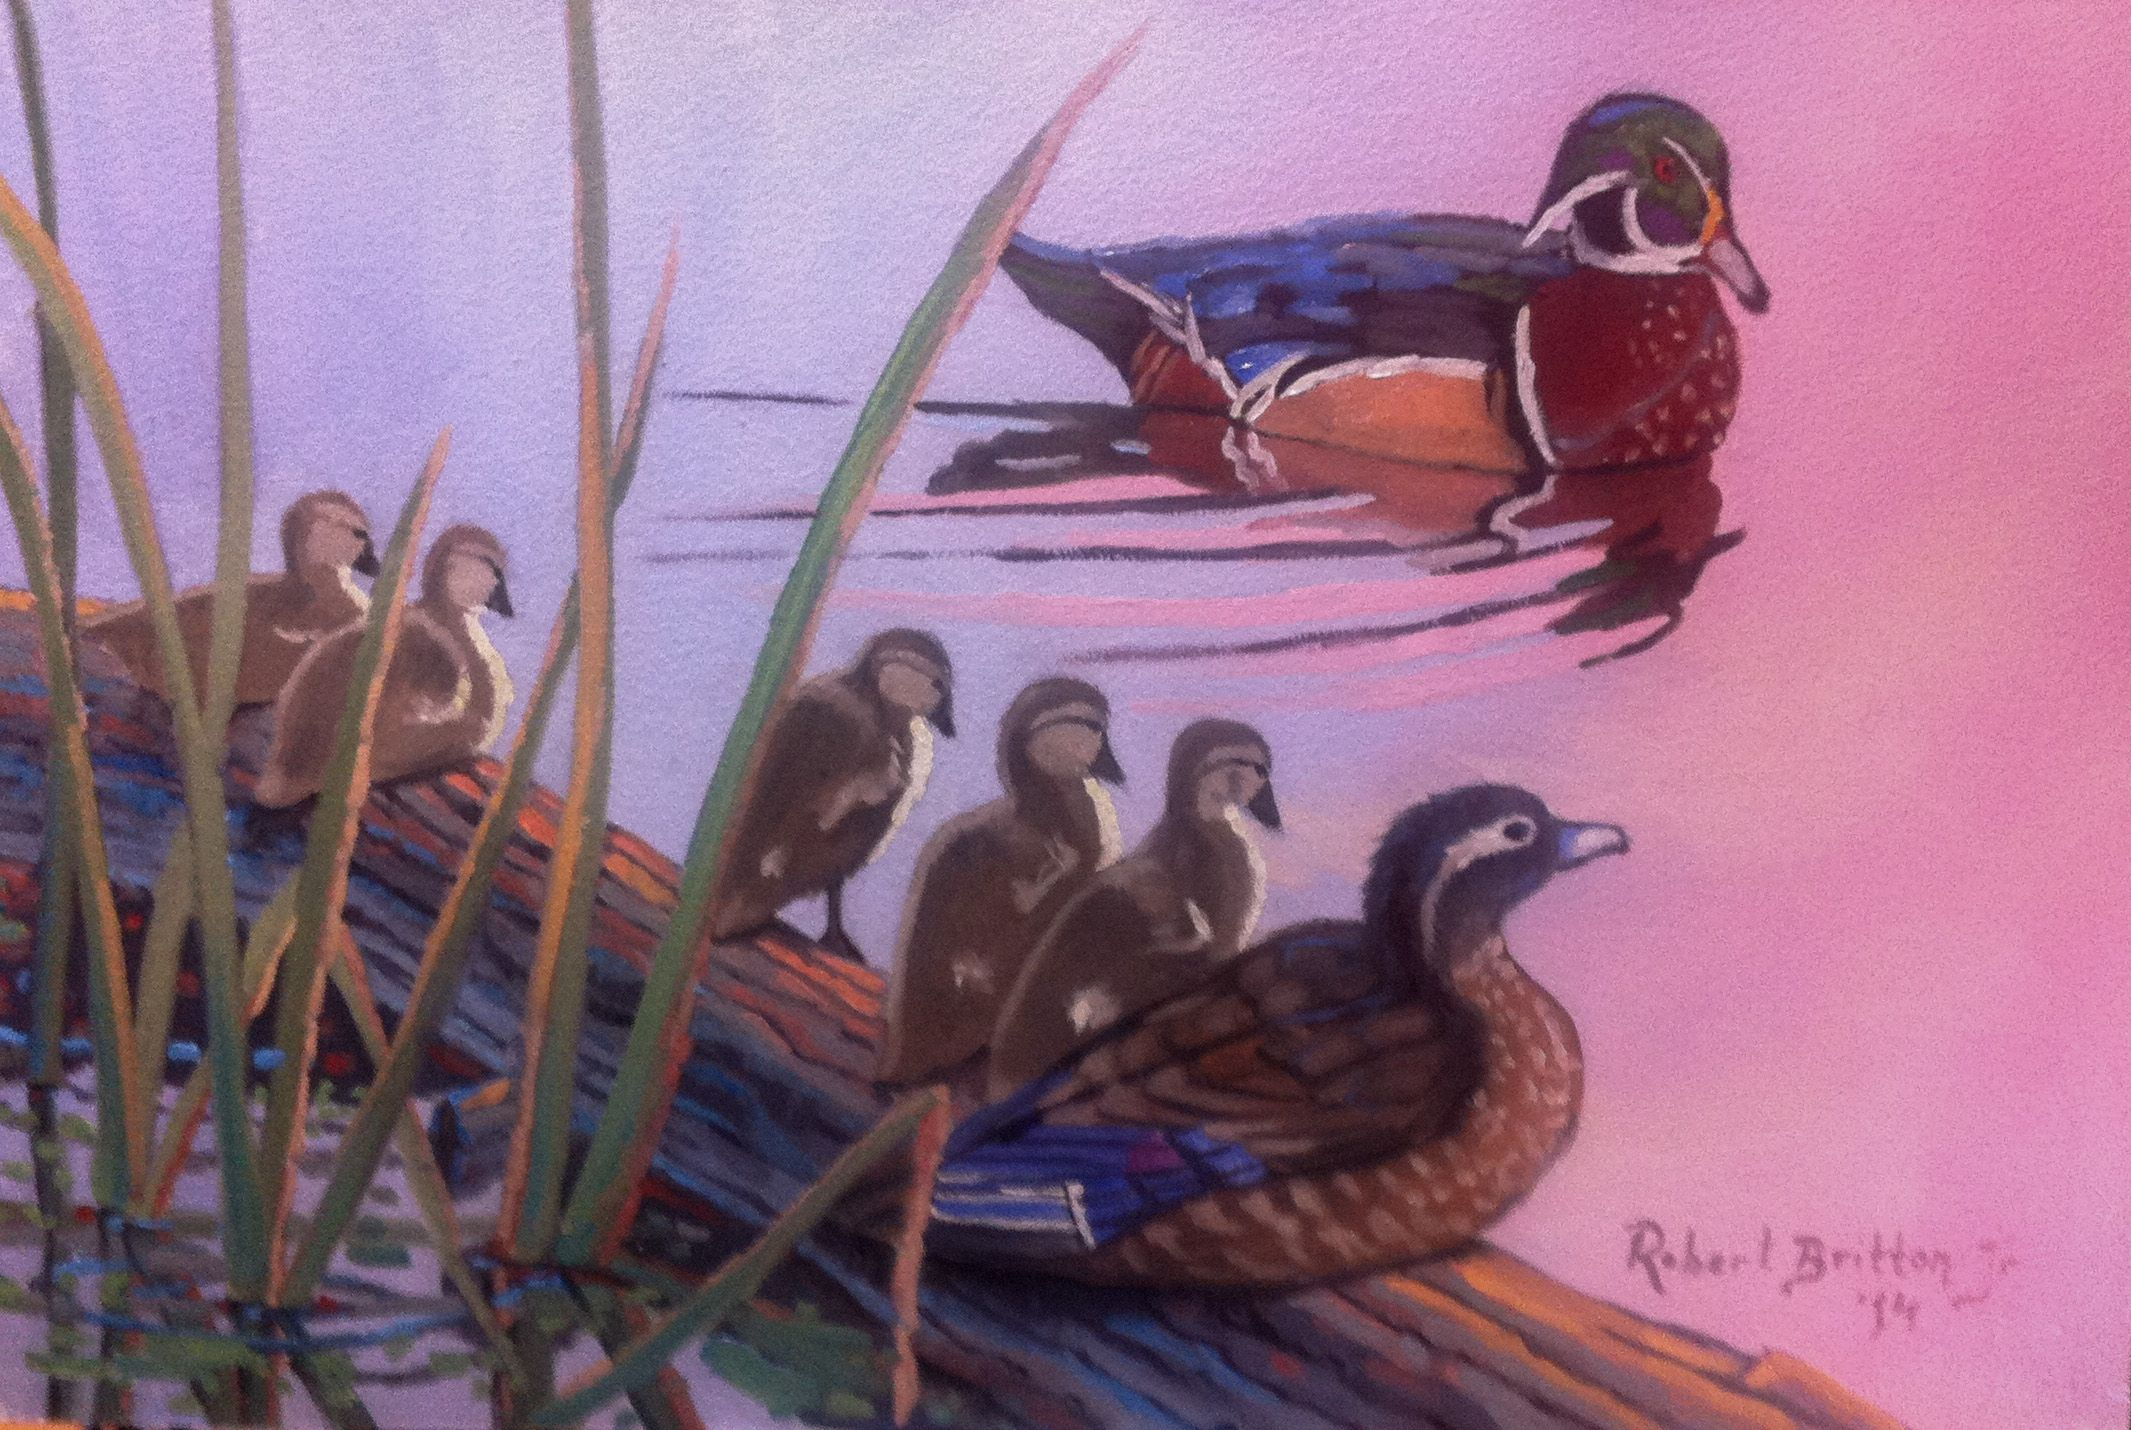 "Woodduck Family Quiet Time 16"" x 24"", Oil on Panel Come visit me on Facebook. http://www.facebook.com/artistrobertpbrittonjr/  Copyright 2014 Artist Robert P. Britton Jr."